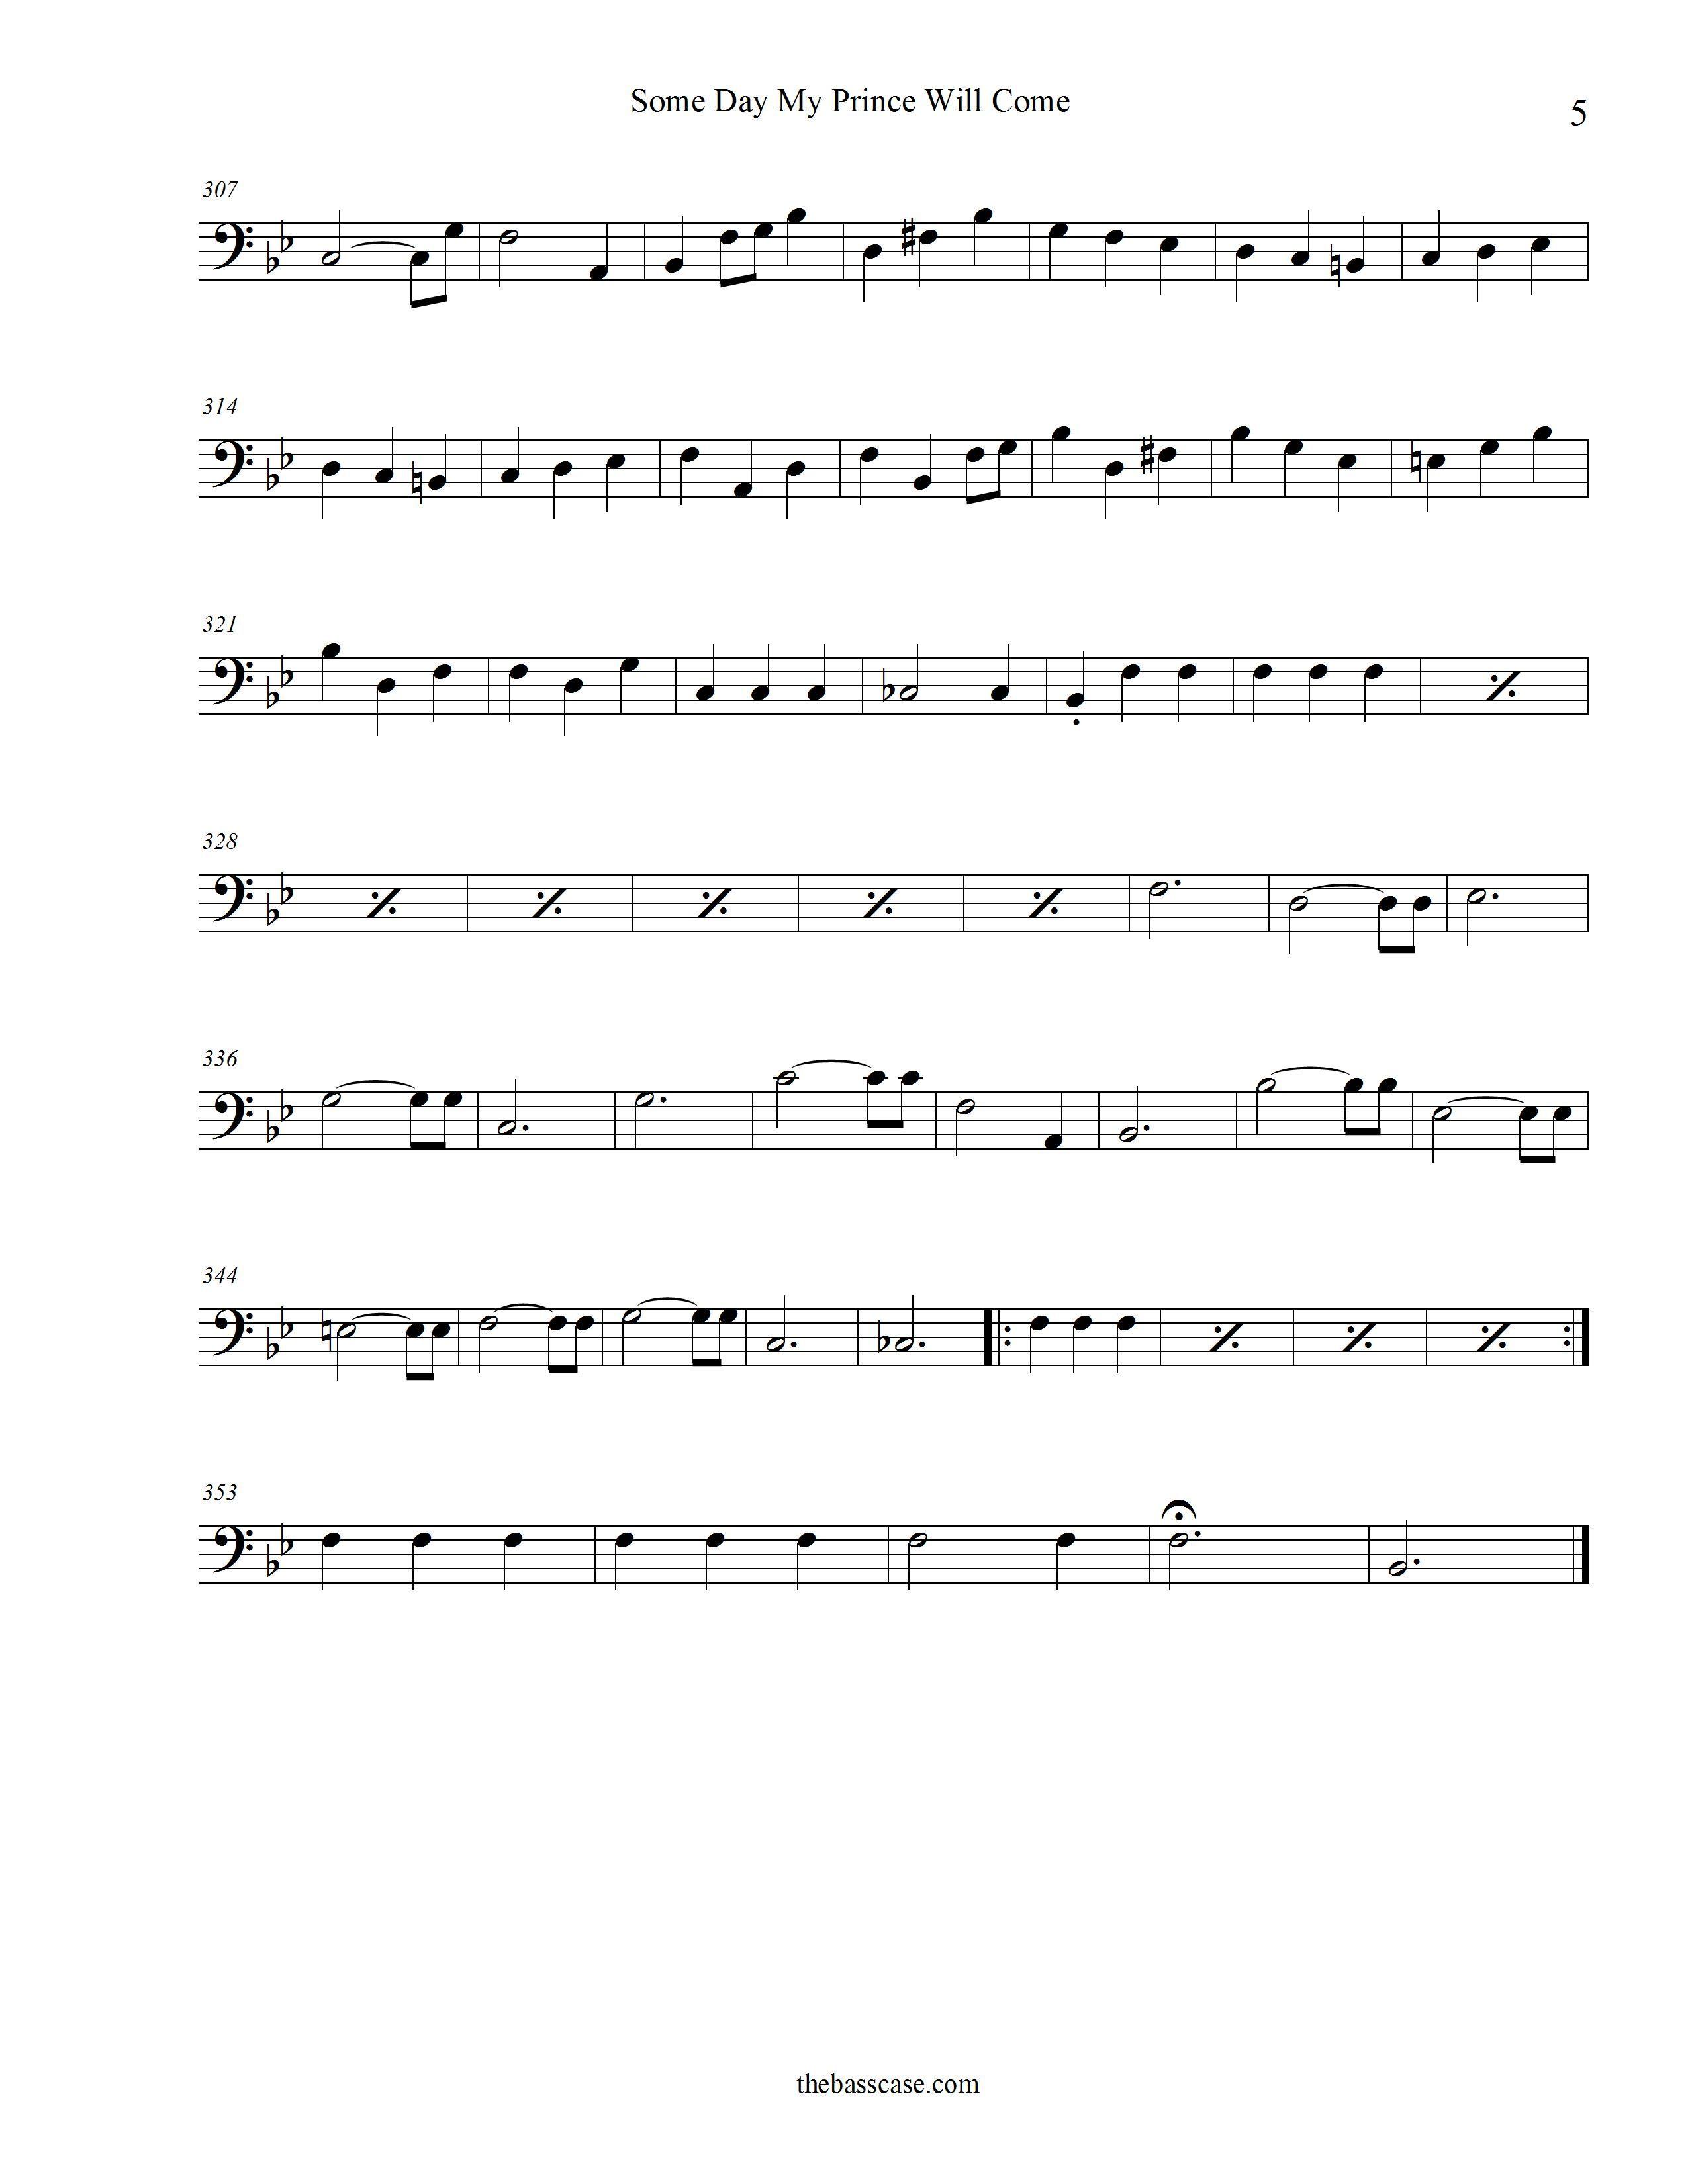 Beginning Bass Clef Songs